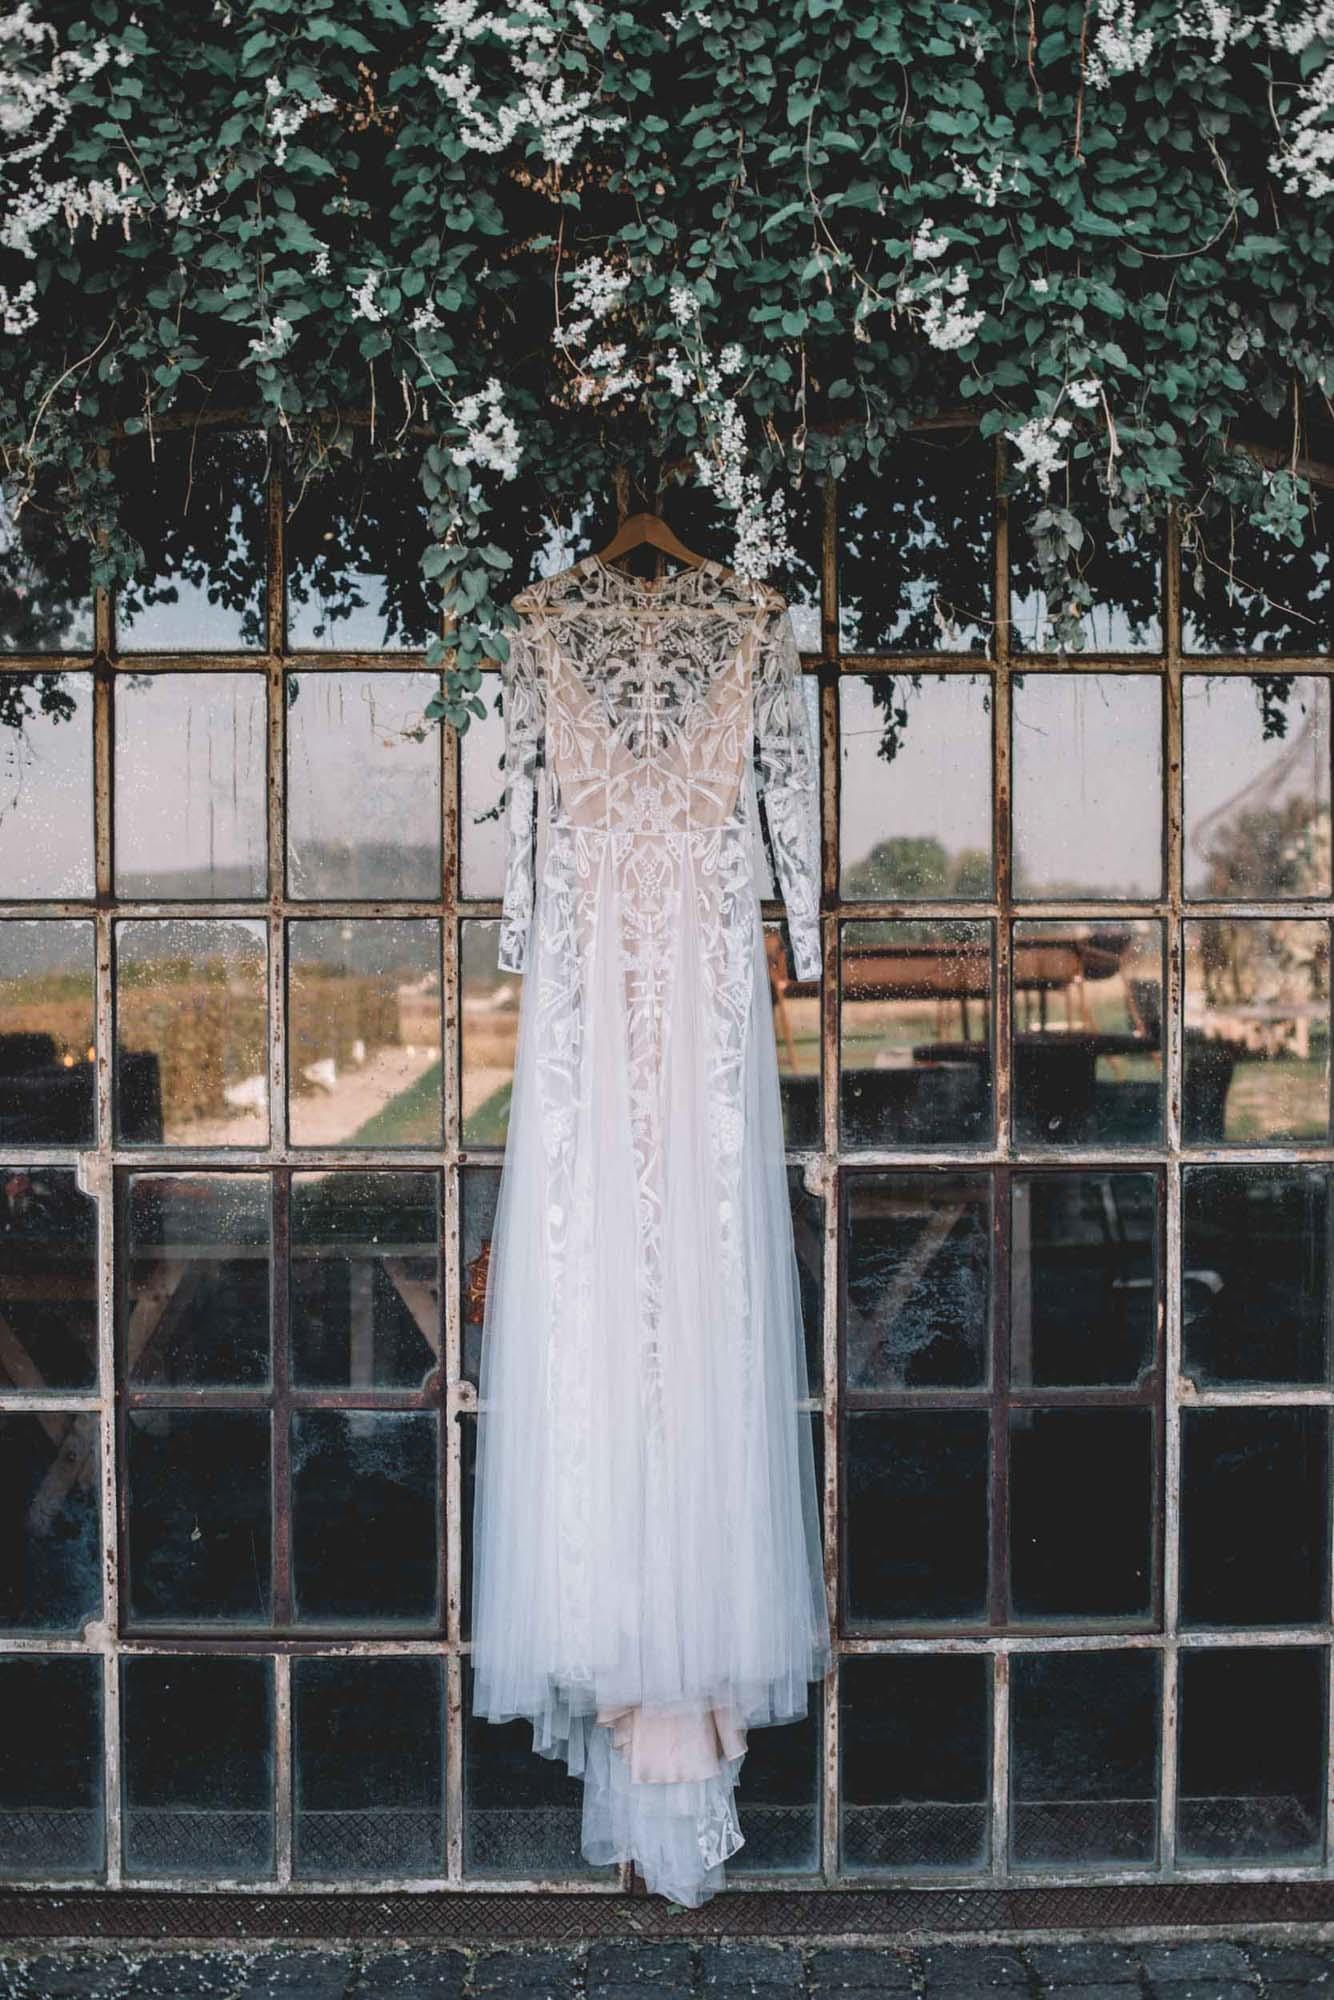 COACHELLA_LES BONNES JOIES_PHOTOGRAPHE_MARIAGE_LES BANDITS-1